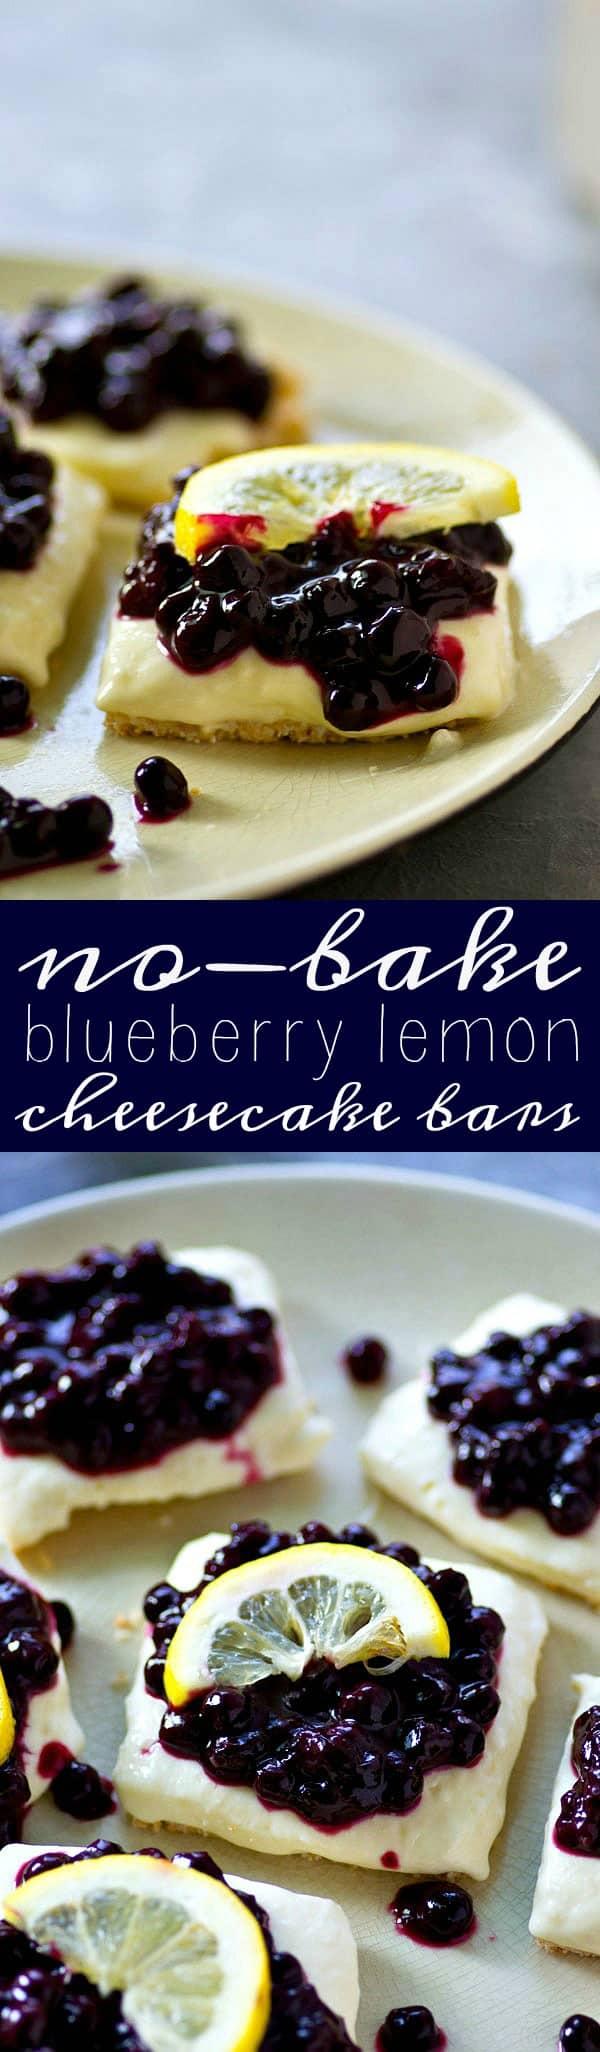 No-Bake Blueberry Lemon Cheesecake Bars